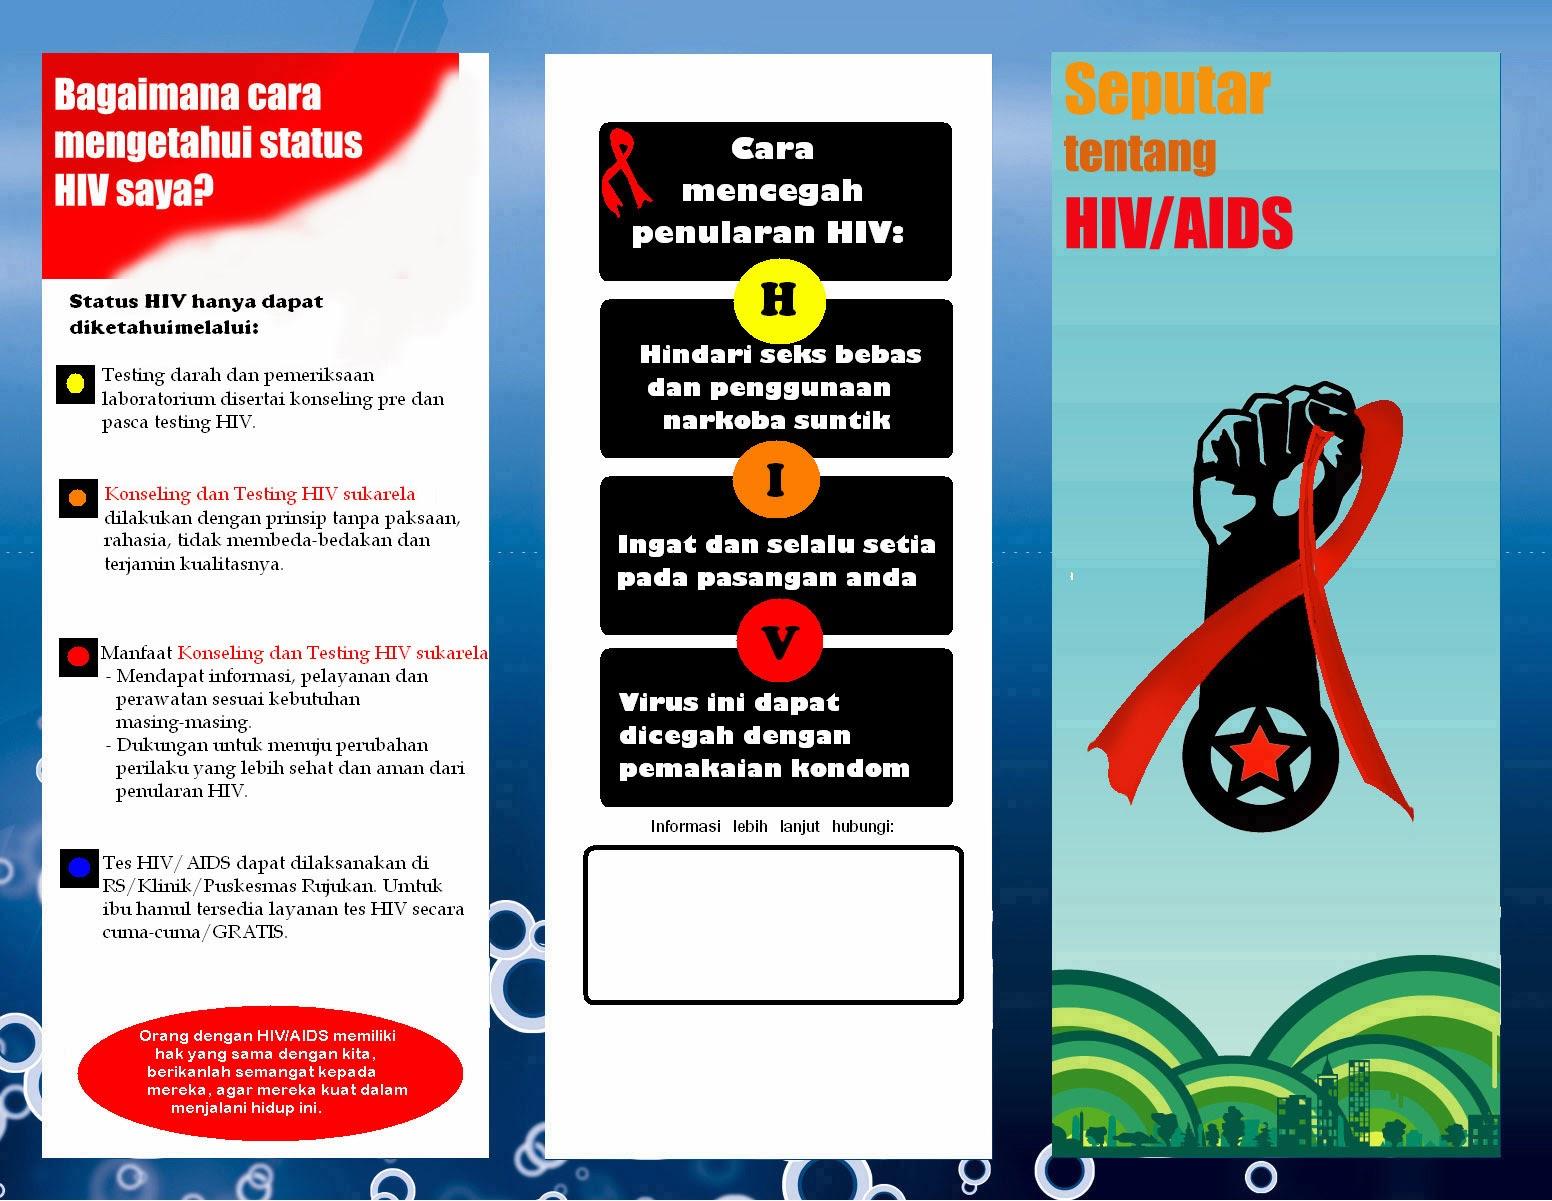 Desain Brosur Hiv Aids Hiv Aids Brochure Design Arif Rahman